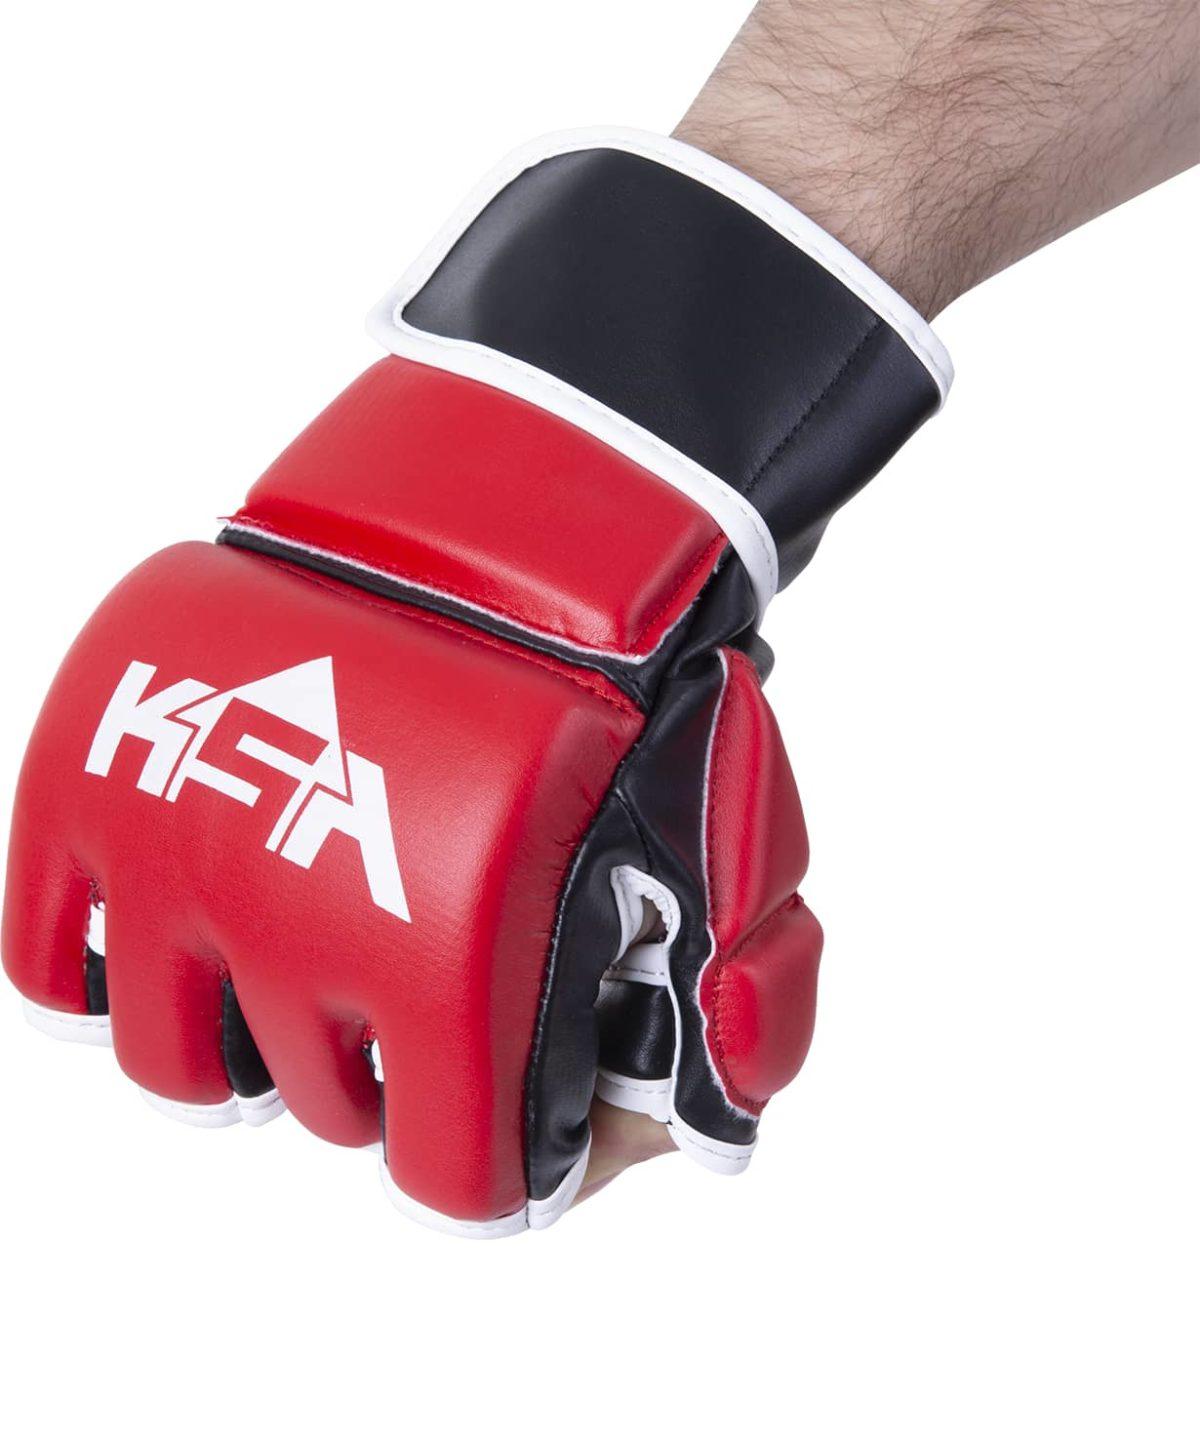 KSA Перчатки для ММА Wasp Red, к/з 7853 - 2